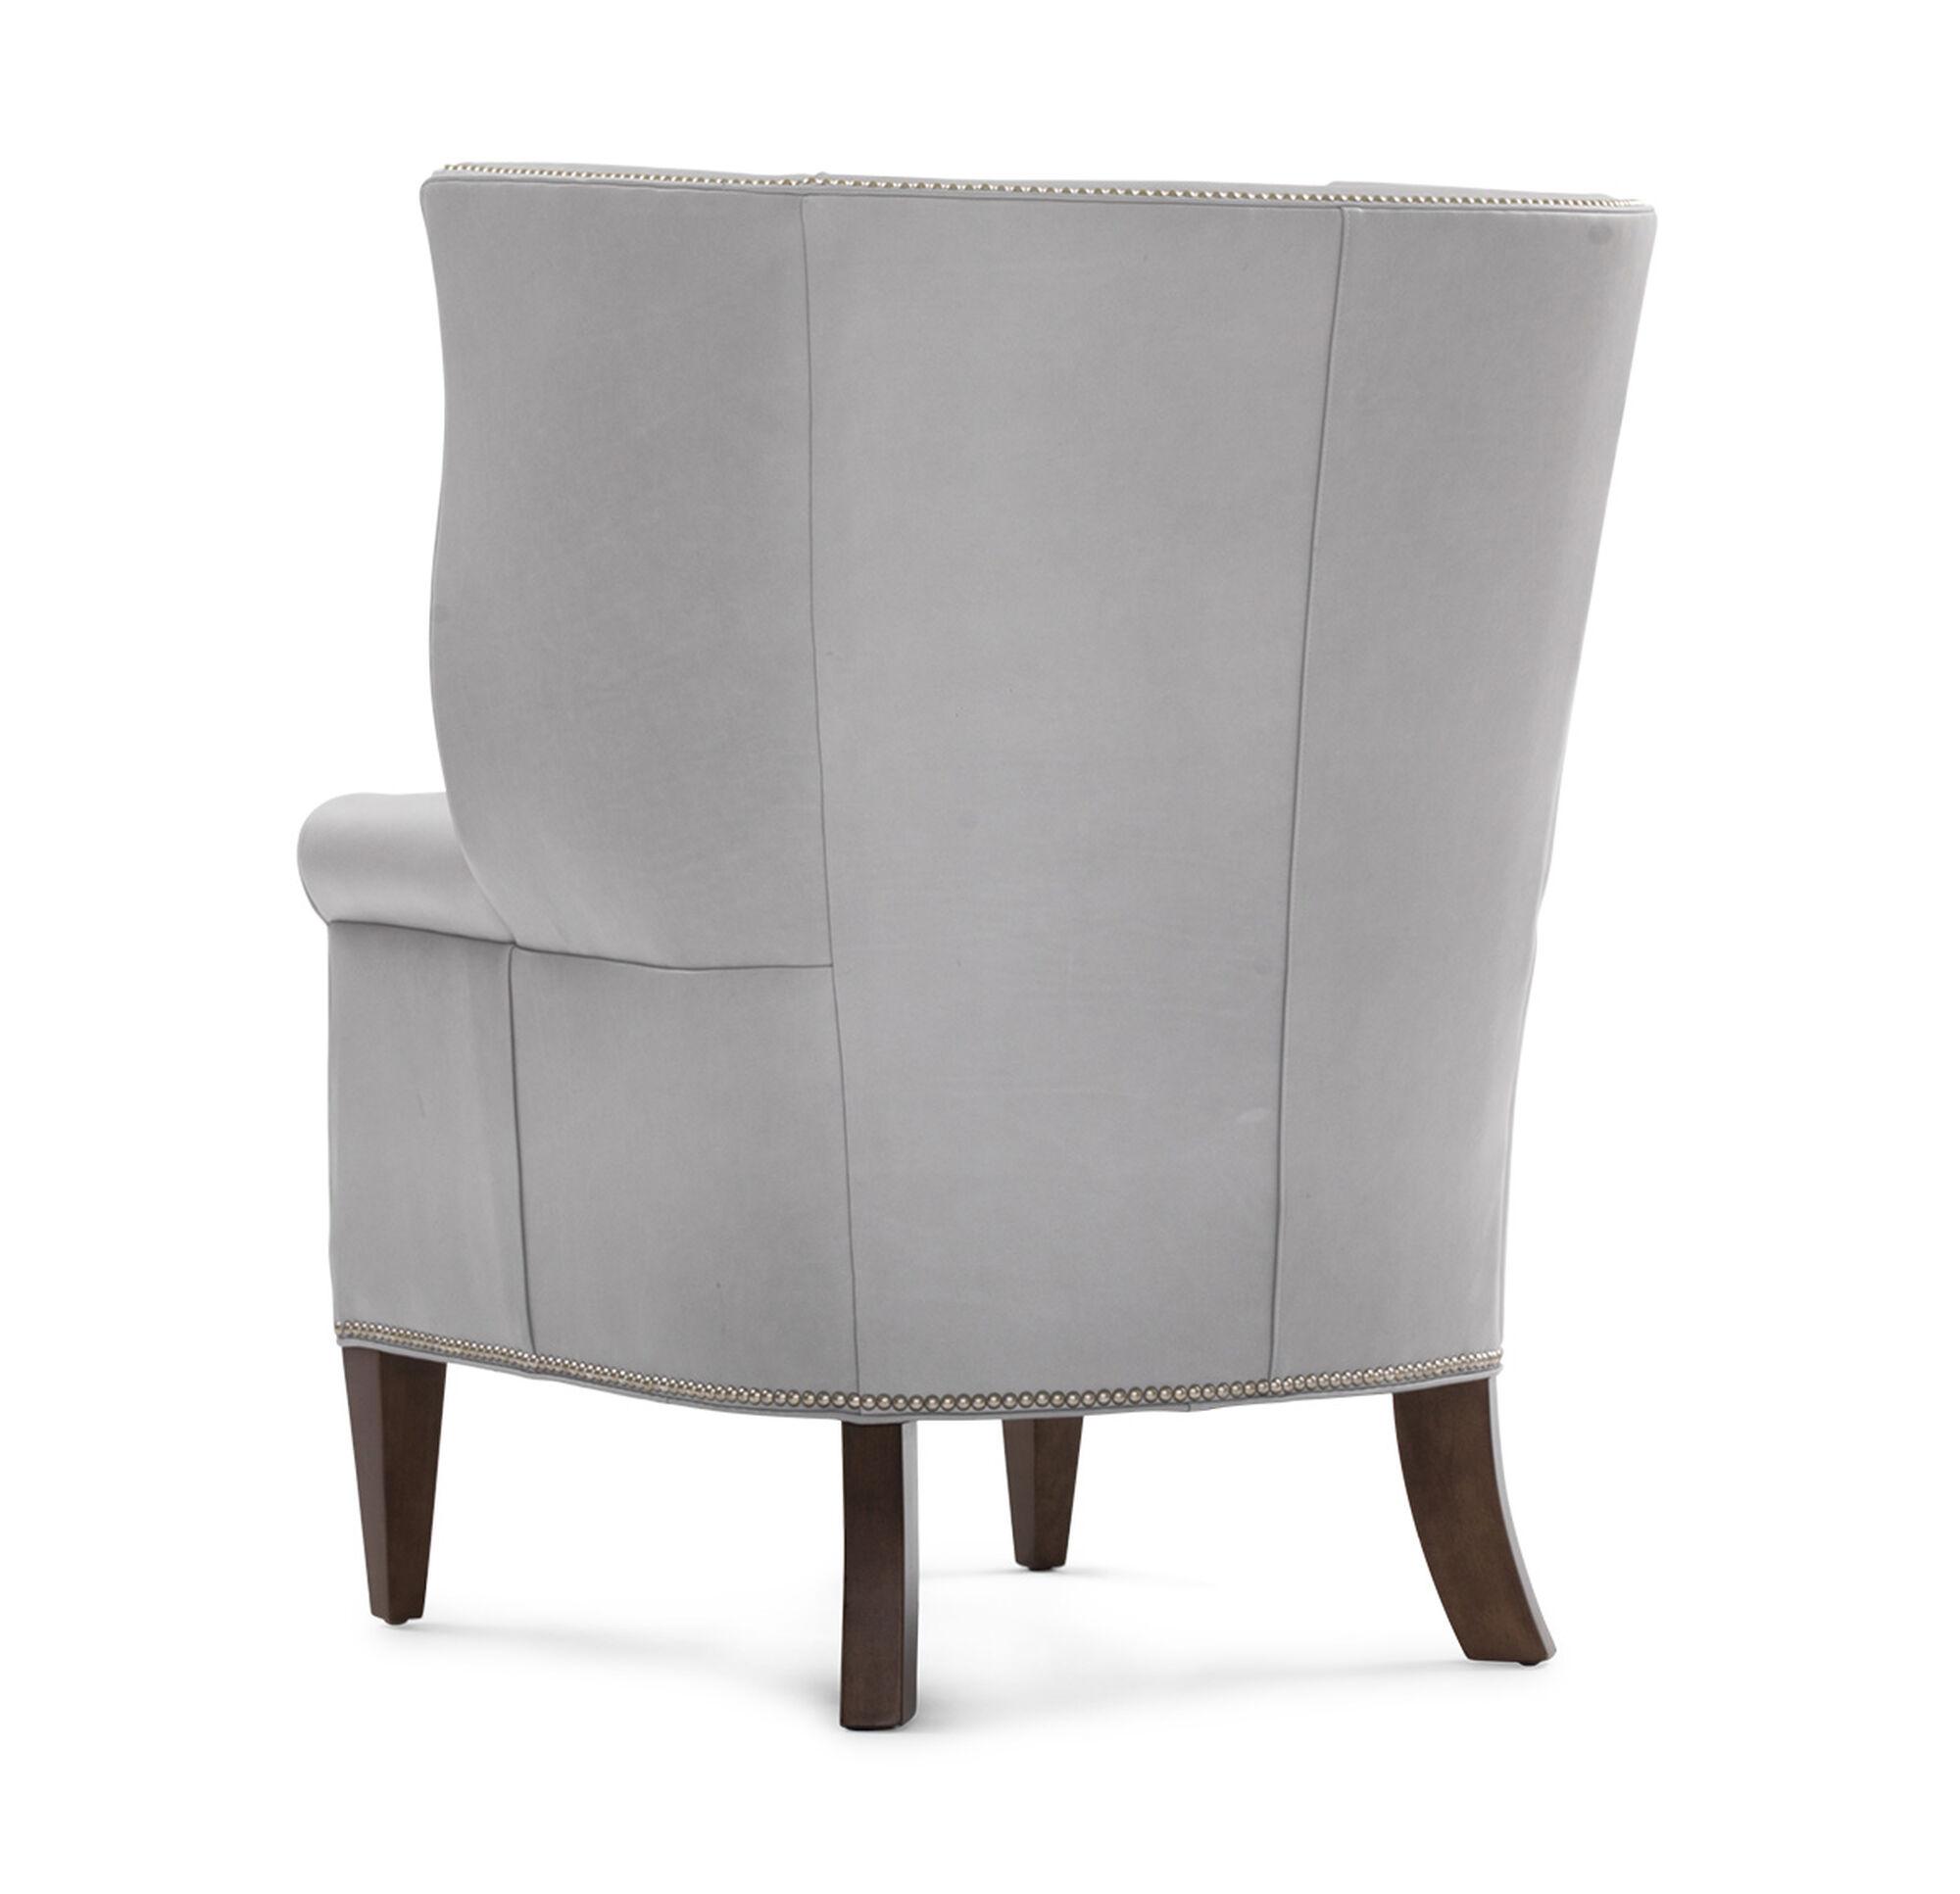 White leather wing chair - White Leather Wing Chair 6